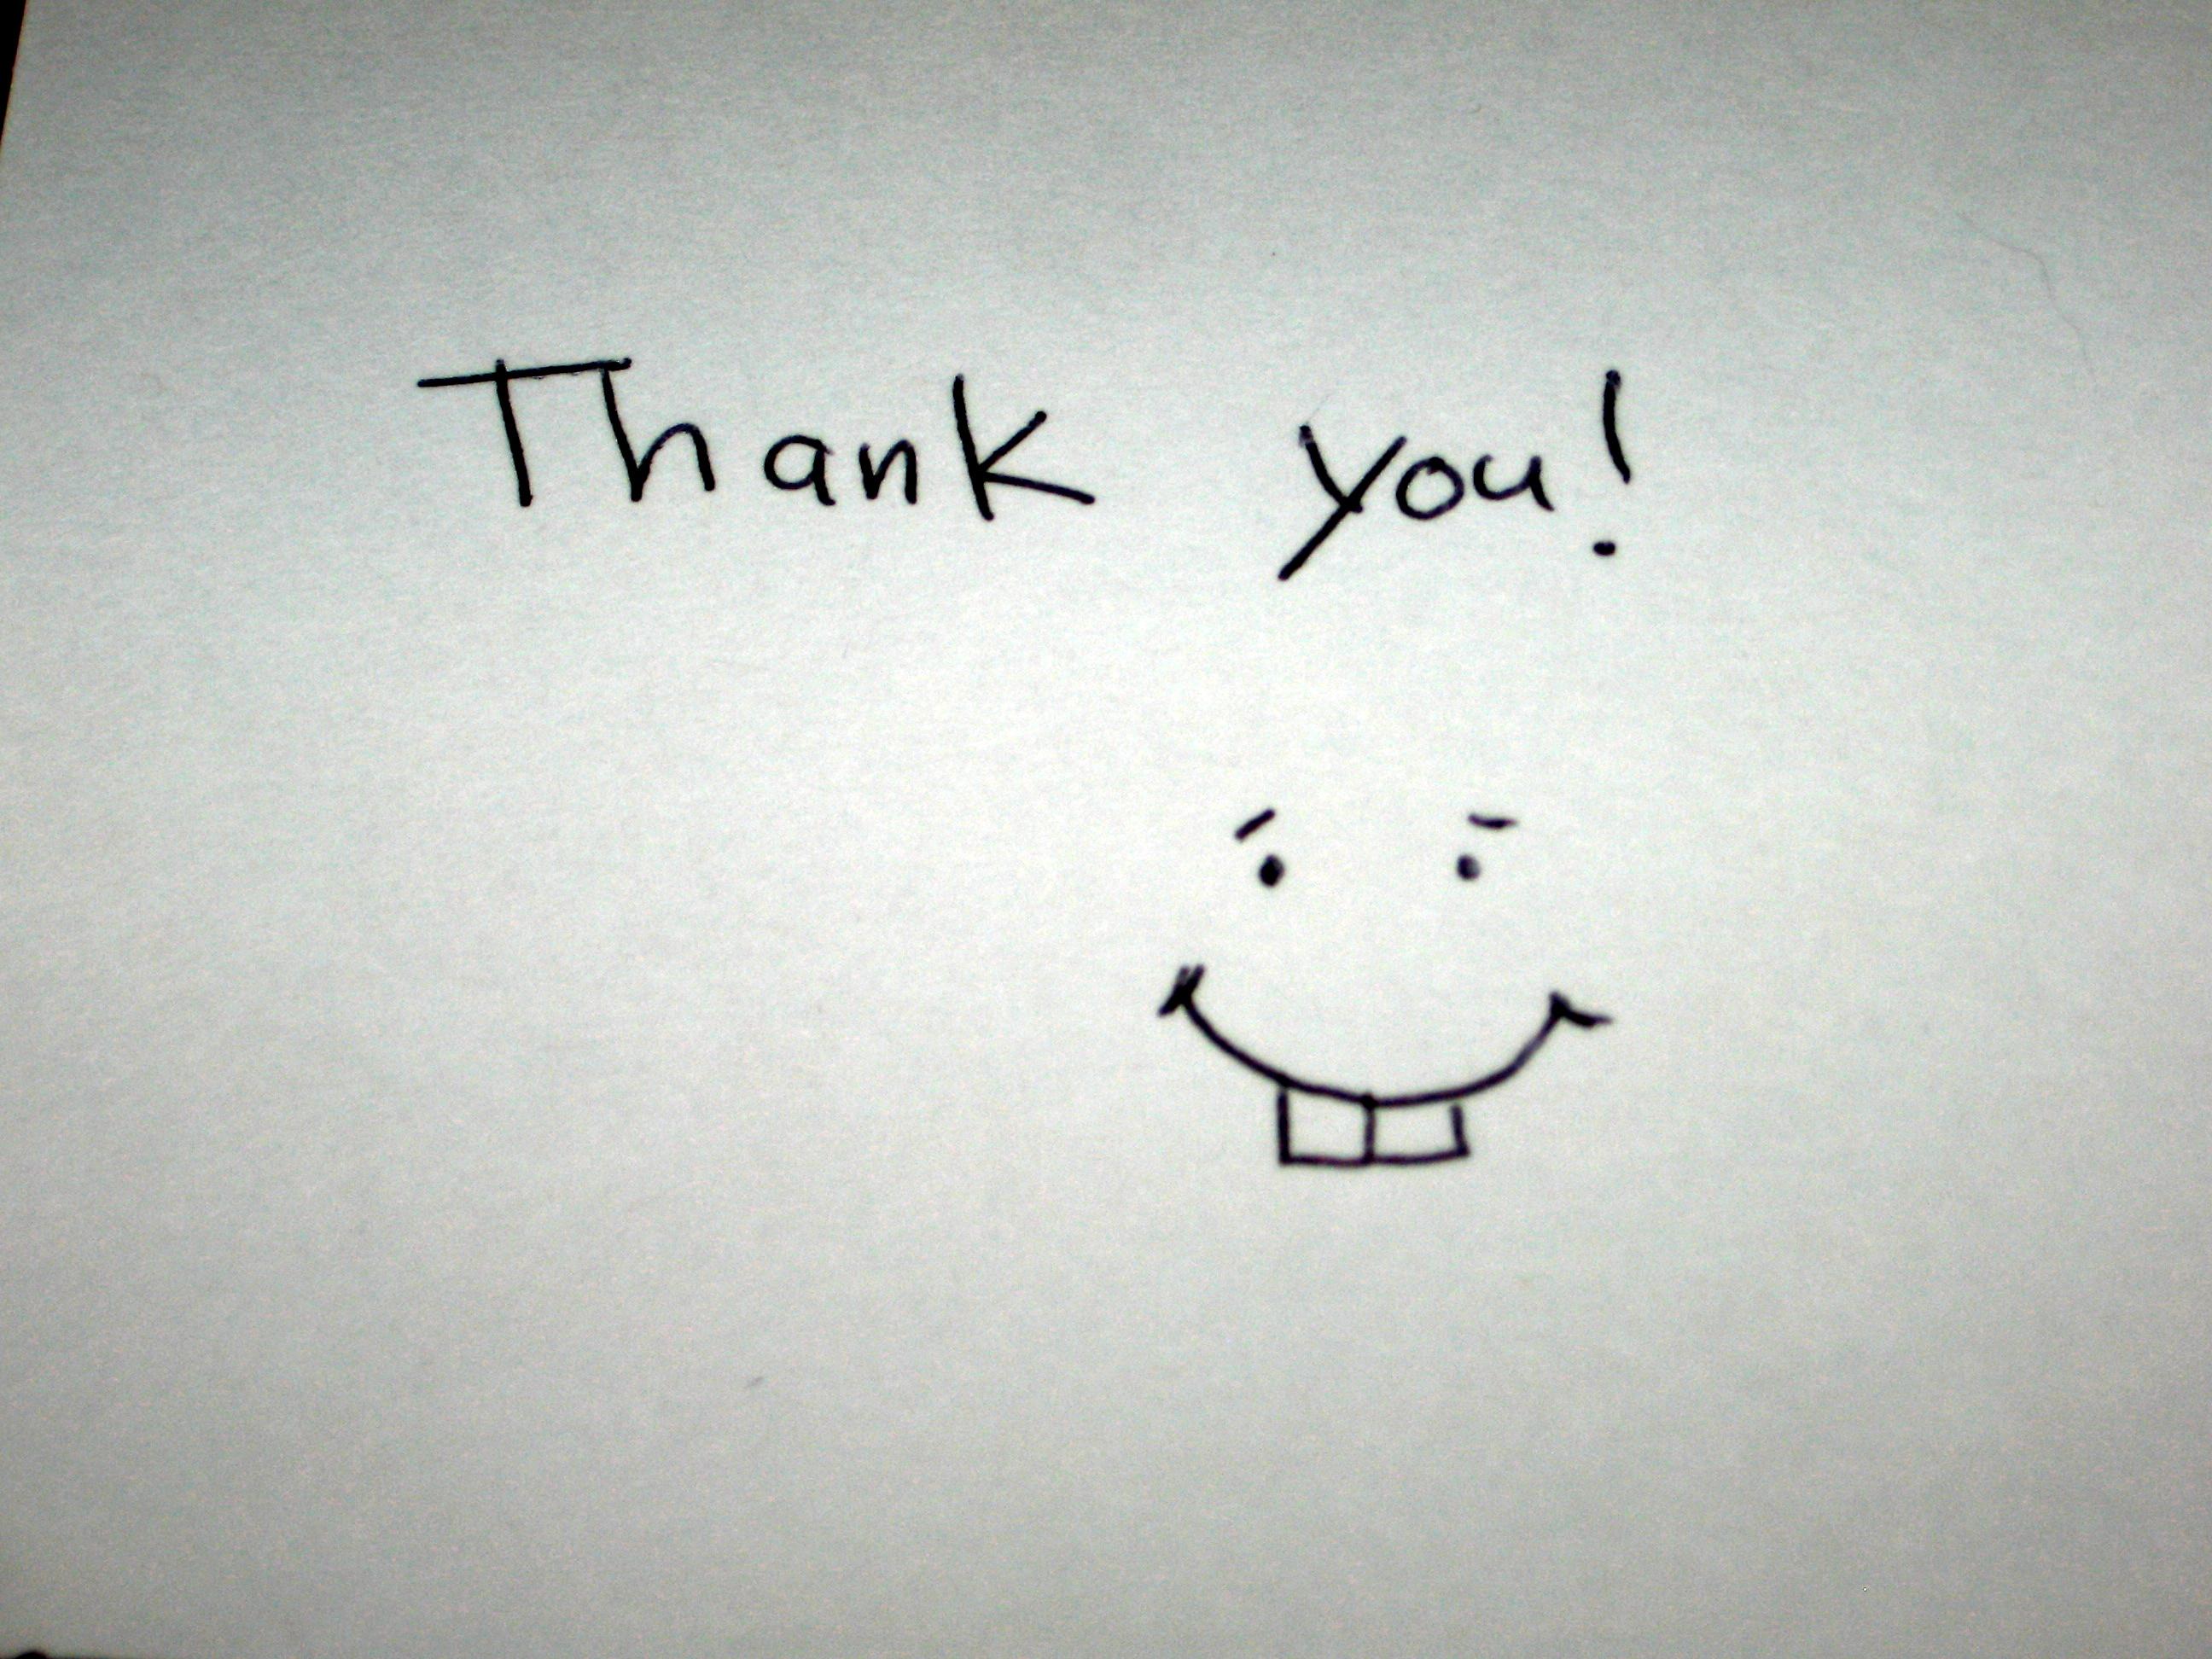 Drawn smile Aryana you drawn By Smile!